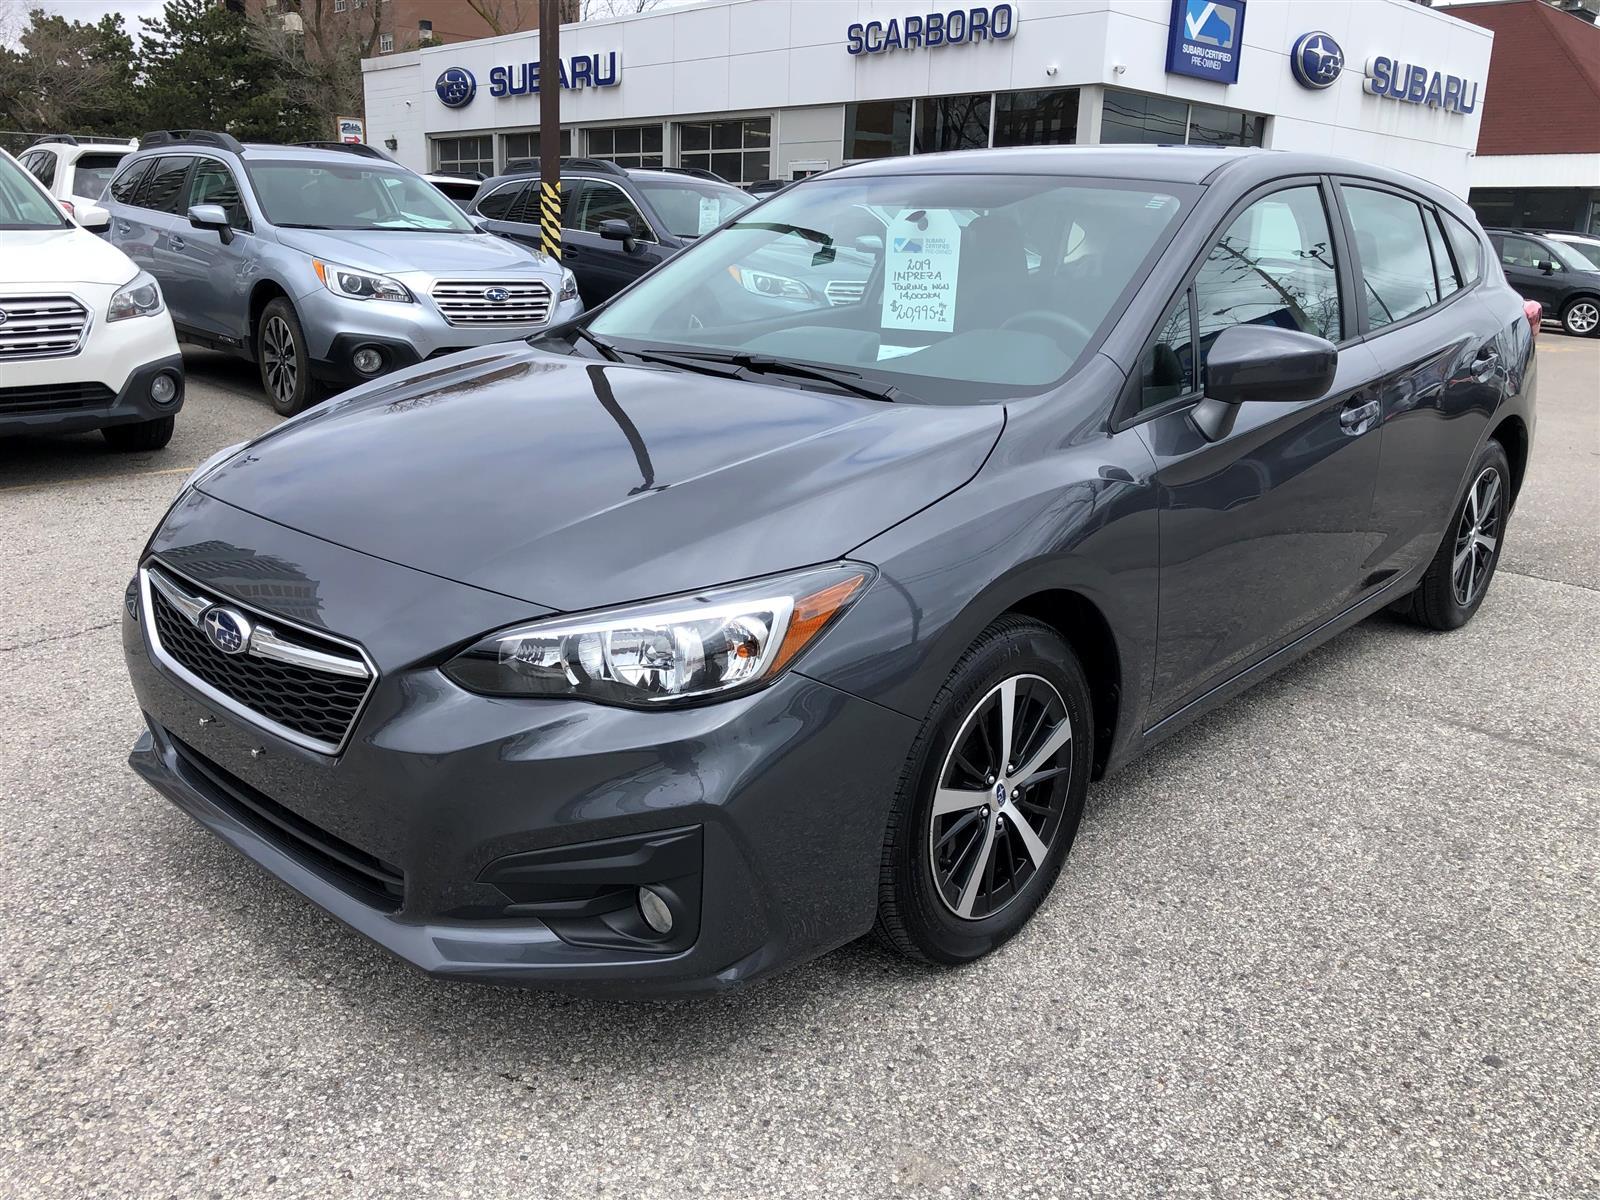 used 2019 Subaru Impreza car, priced at $20,995